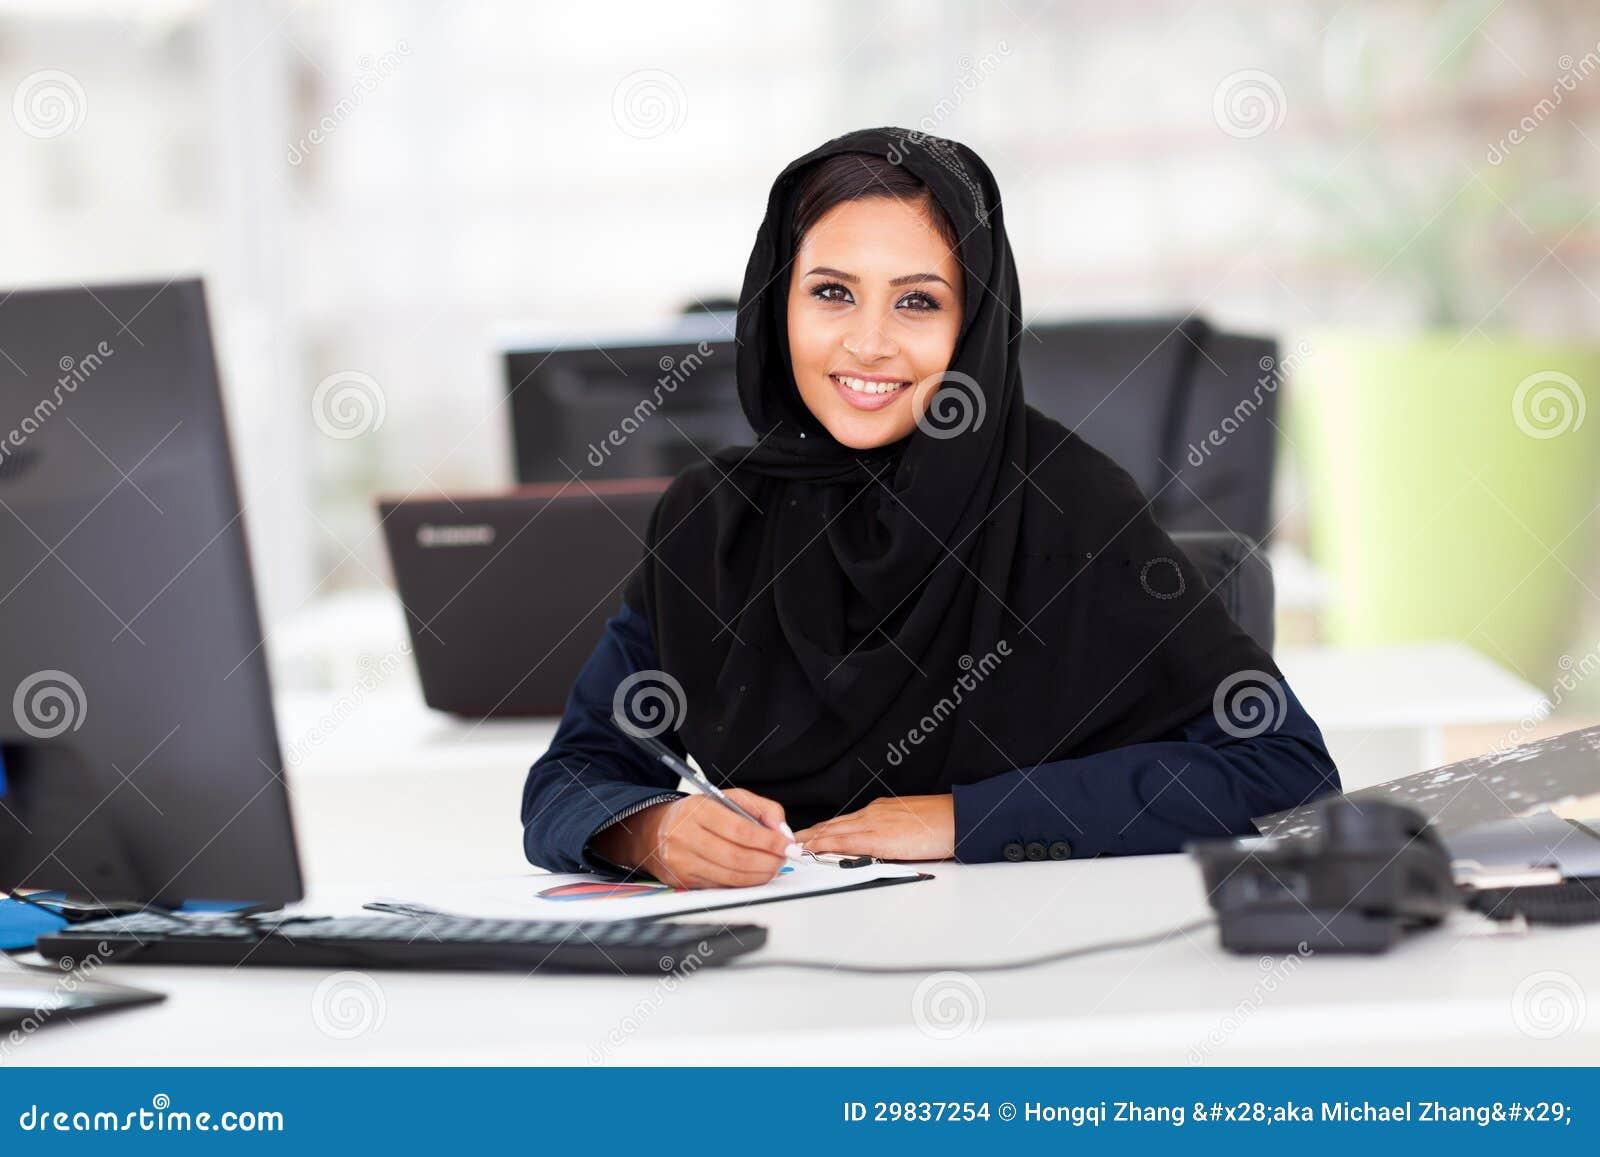 Employé de bureau arabe photo stock image du fille dame